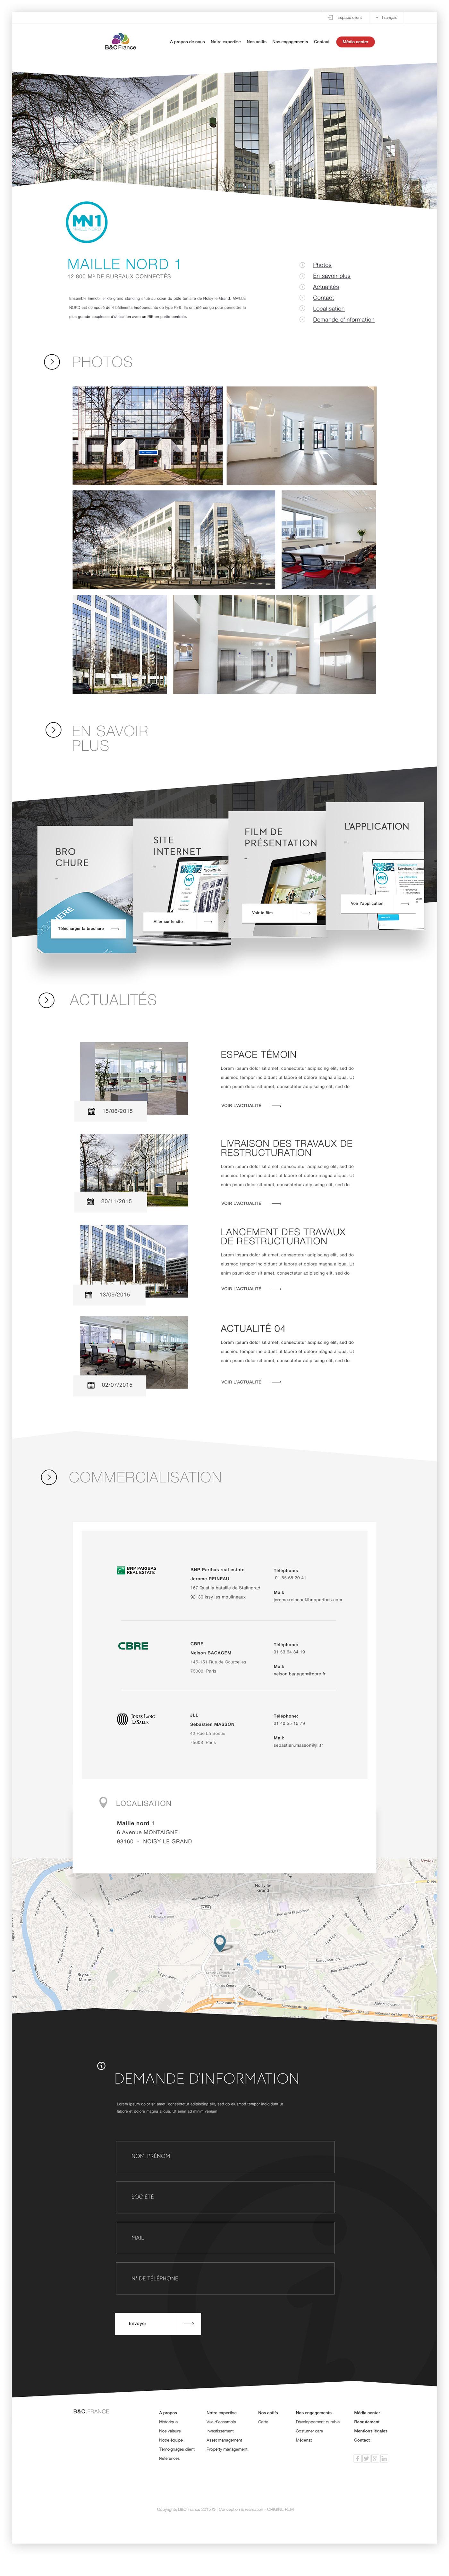 B&C France - Page projet - 09